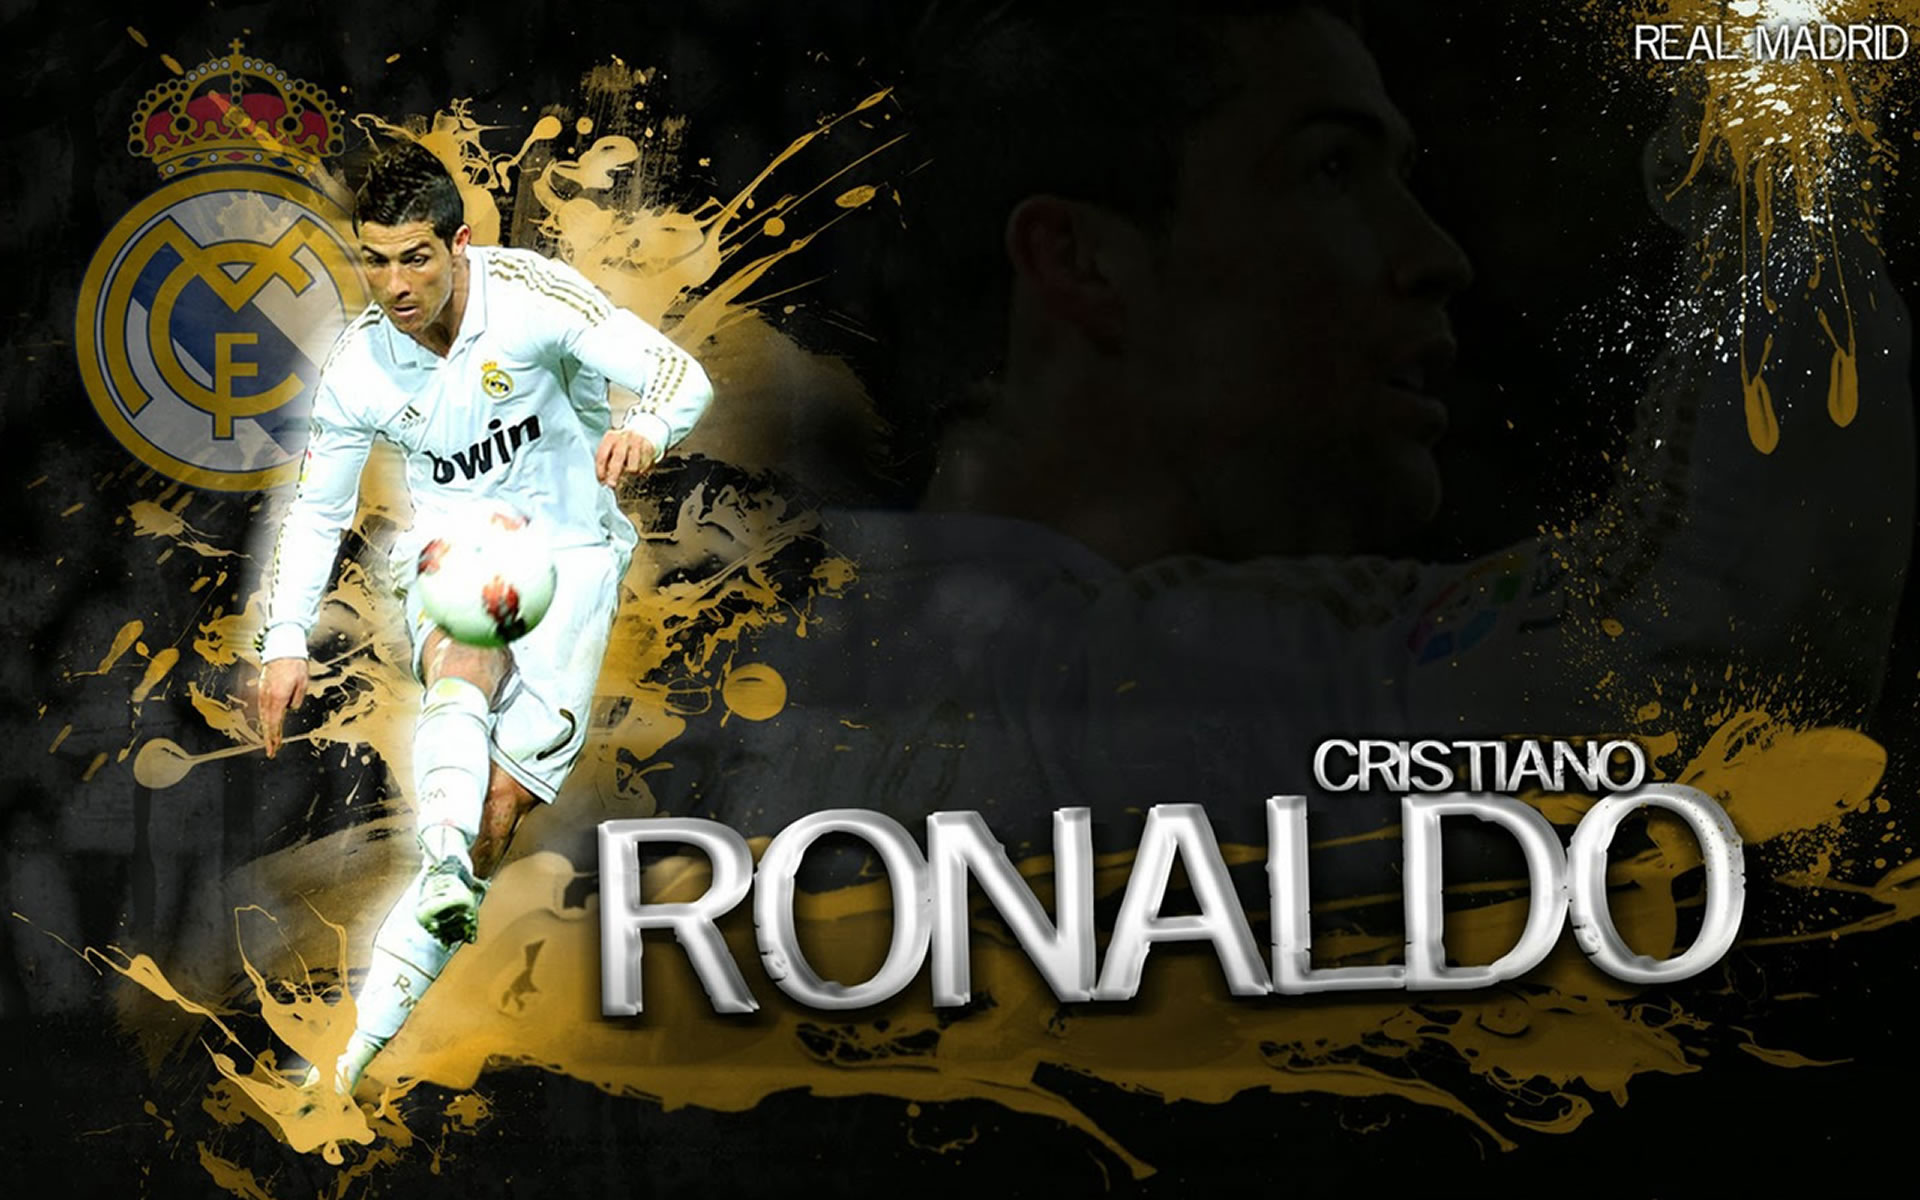 ... cristiano ronaldo wallpapers cristiano ronaldo wallpaper real madrid